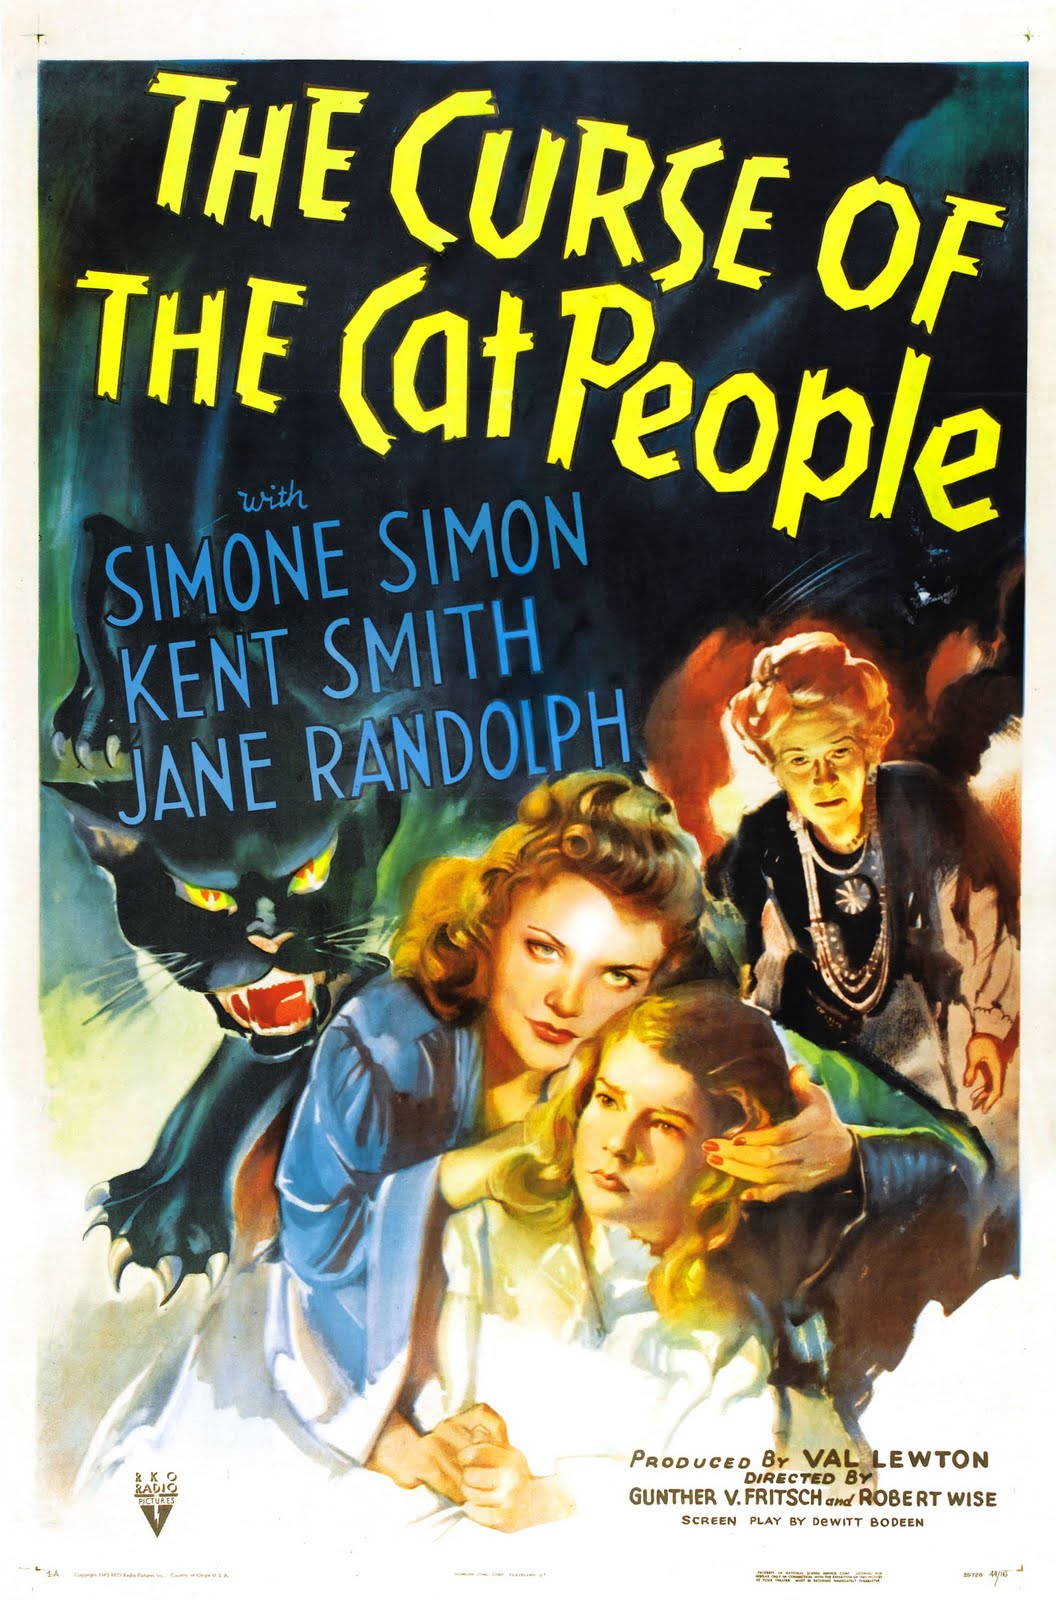 http://4.bp.blogspot.com/_q9gTdYDKI3U/S-wik7EyHDI/AAAAAAAACeA/RoLgE8MADZ4/s1600/curse_of_cat_people_poster_01.jpg